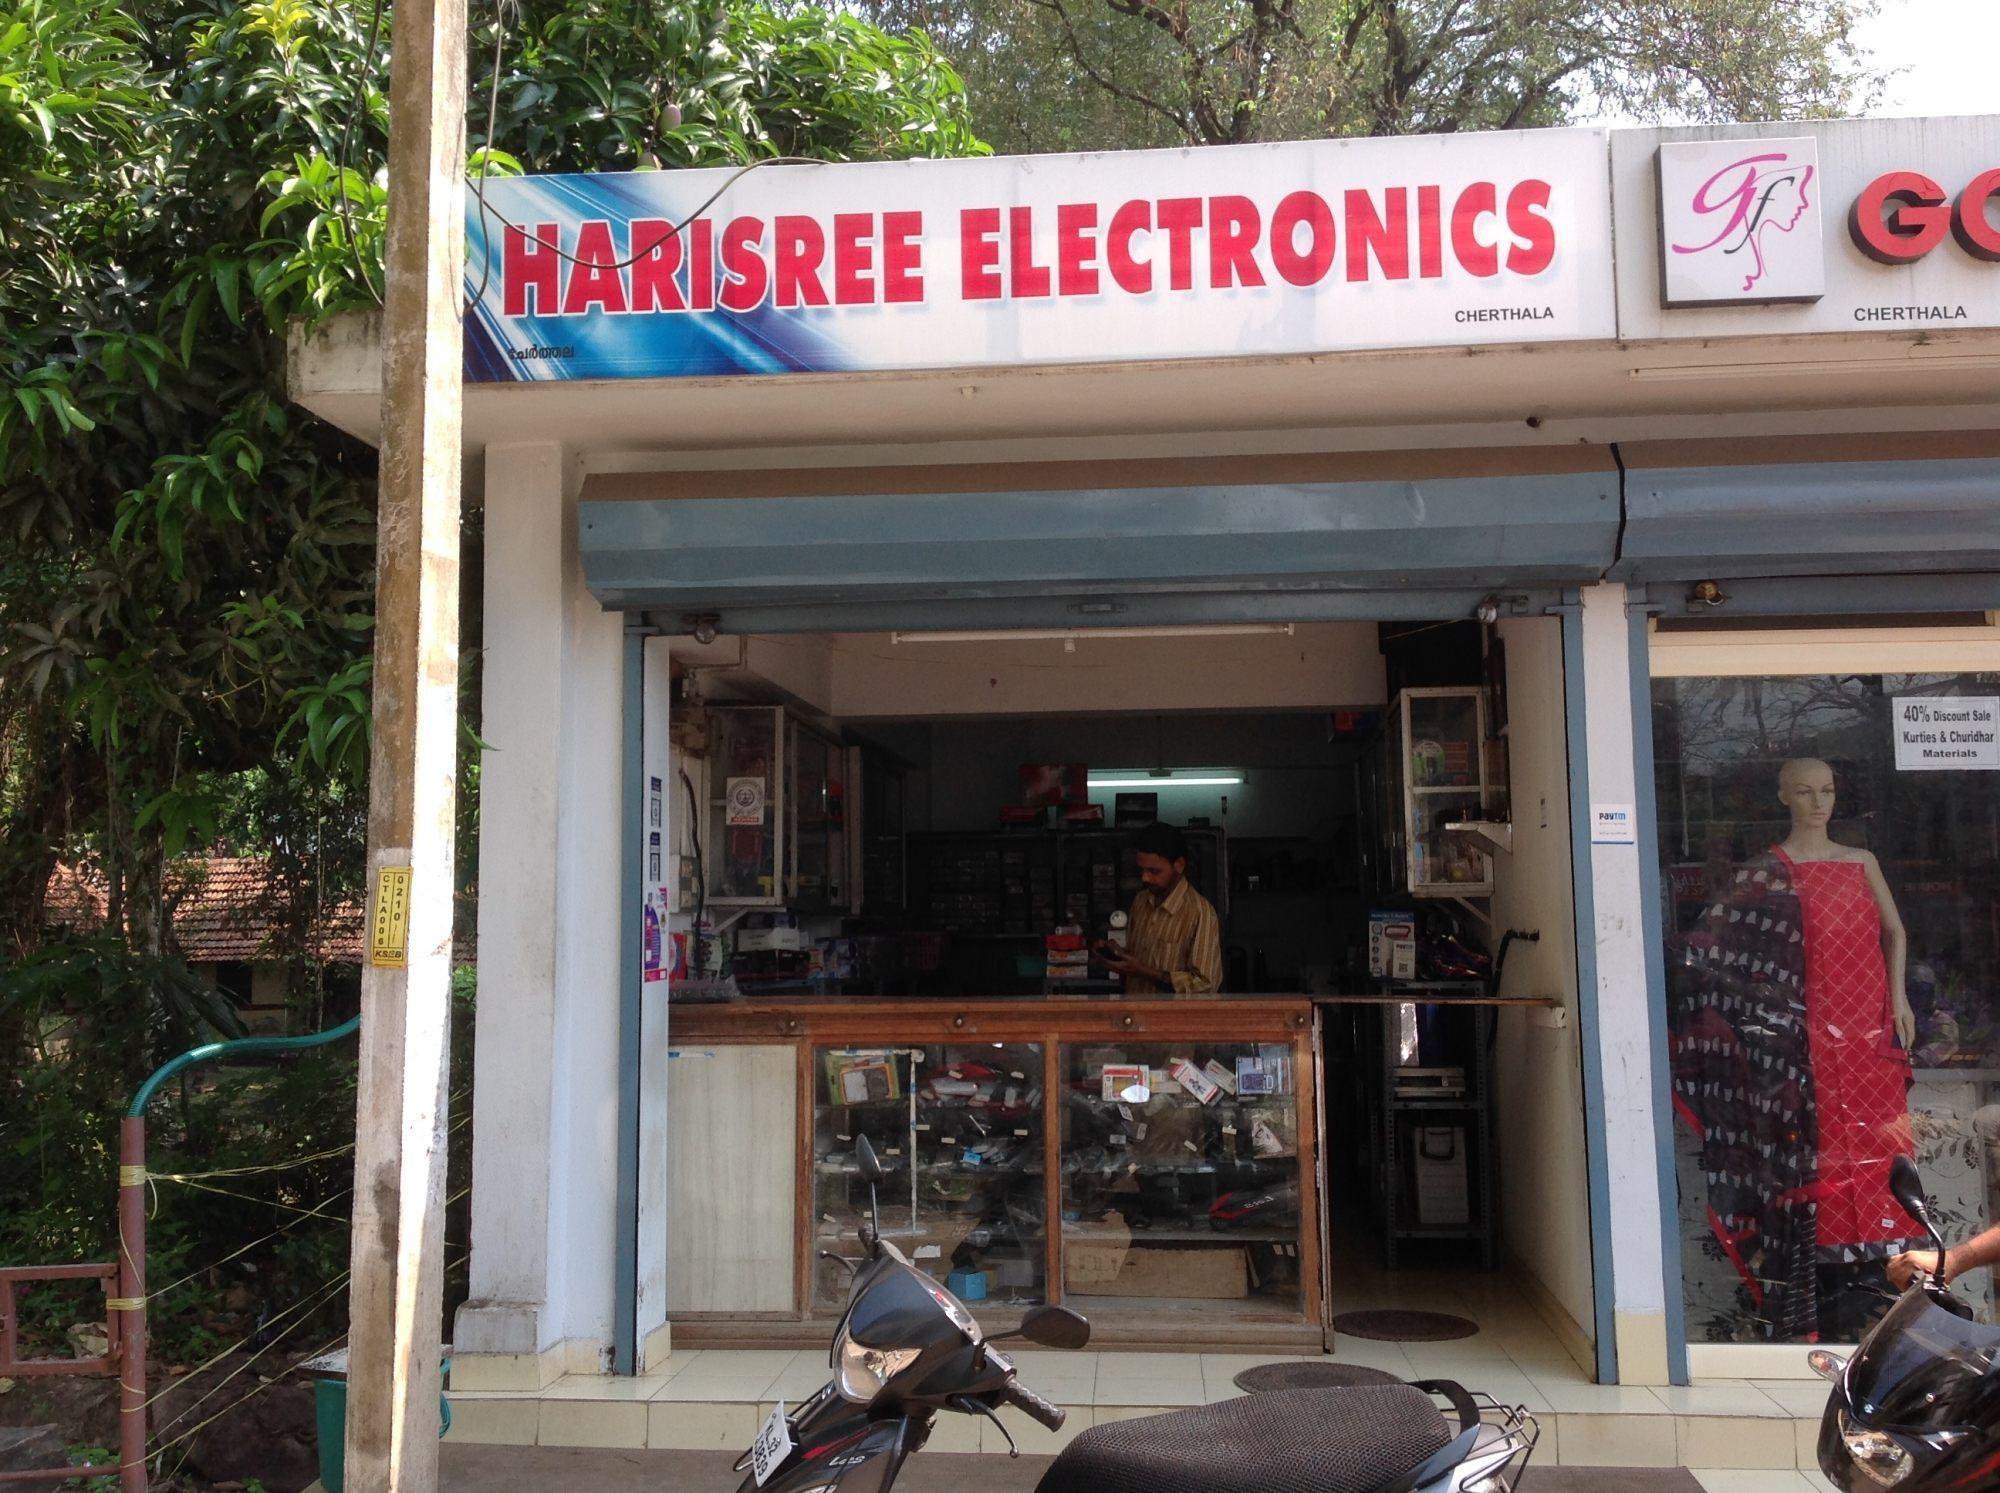 Harisree Electronics, ELECTRONICS REPAIRING,  service in Cherthala, Alappuzha